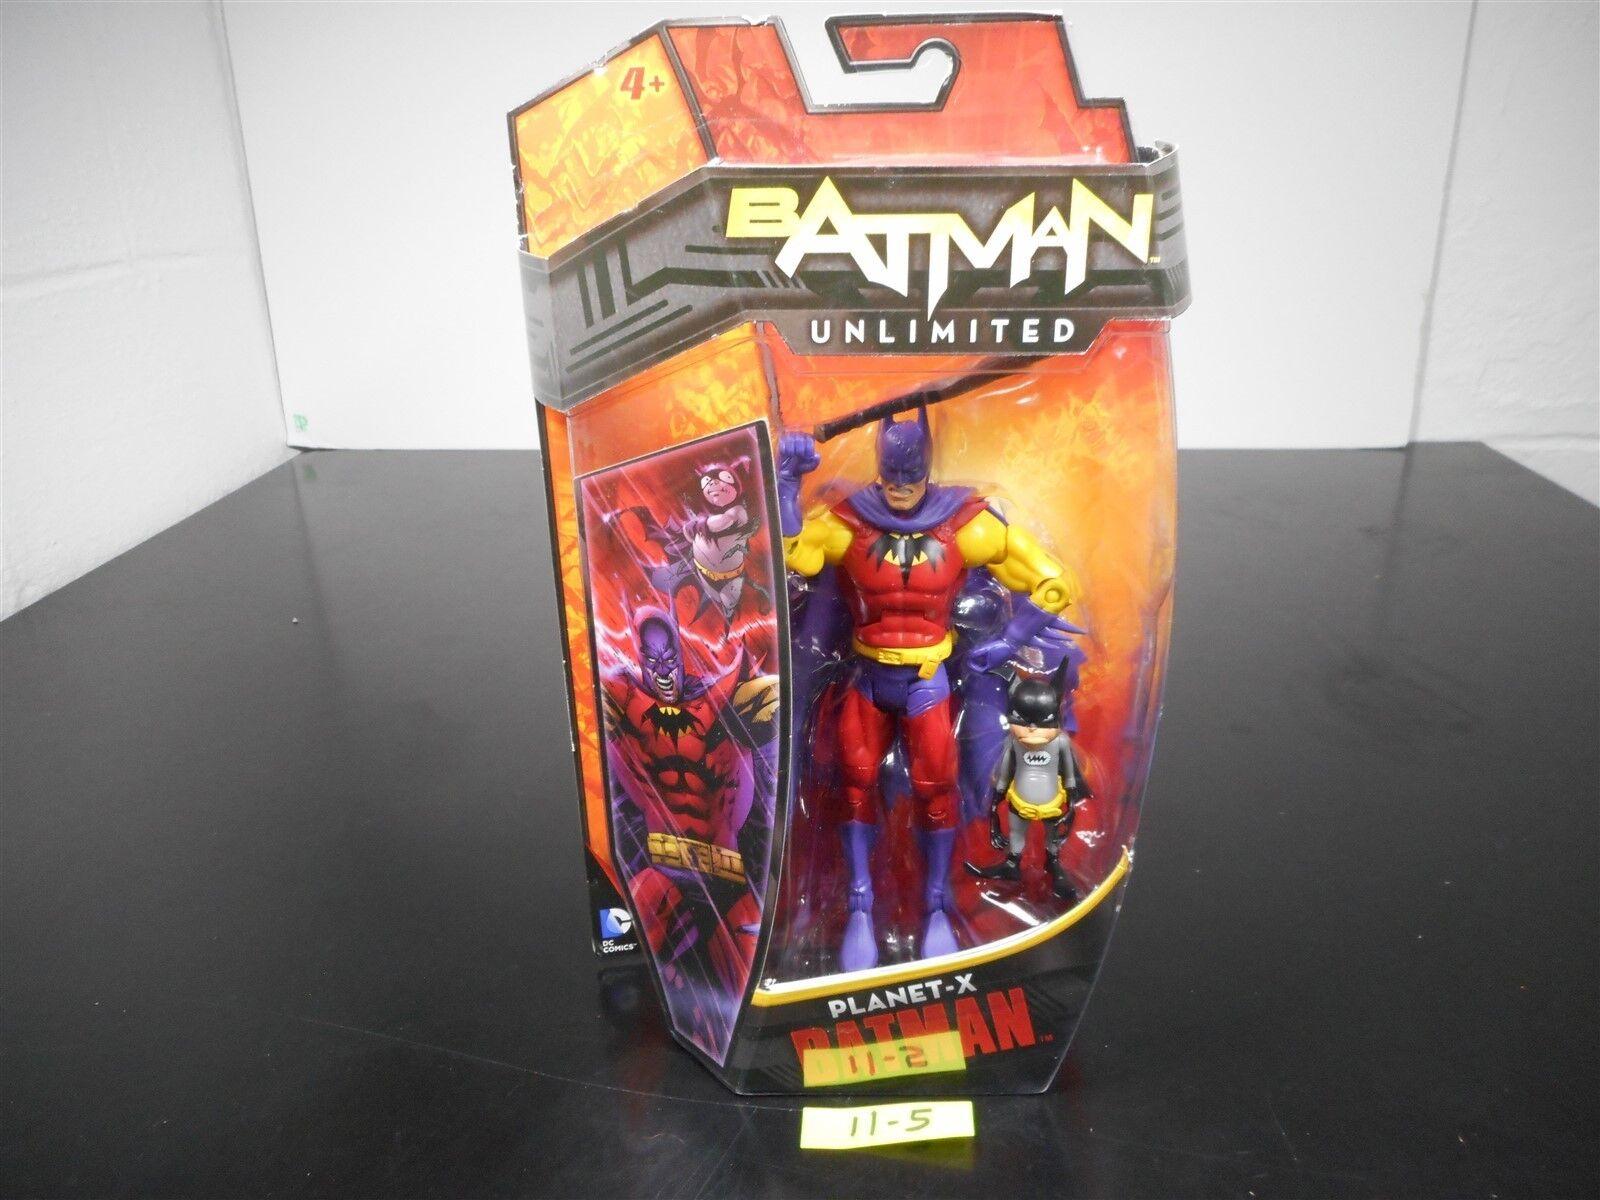 NEW & SEALED    BATMAN UNLIMITED PLANET-X BATMAN ACTION FIGURE DC COMICS 11-5